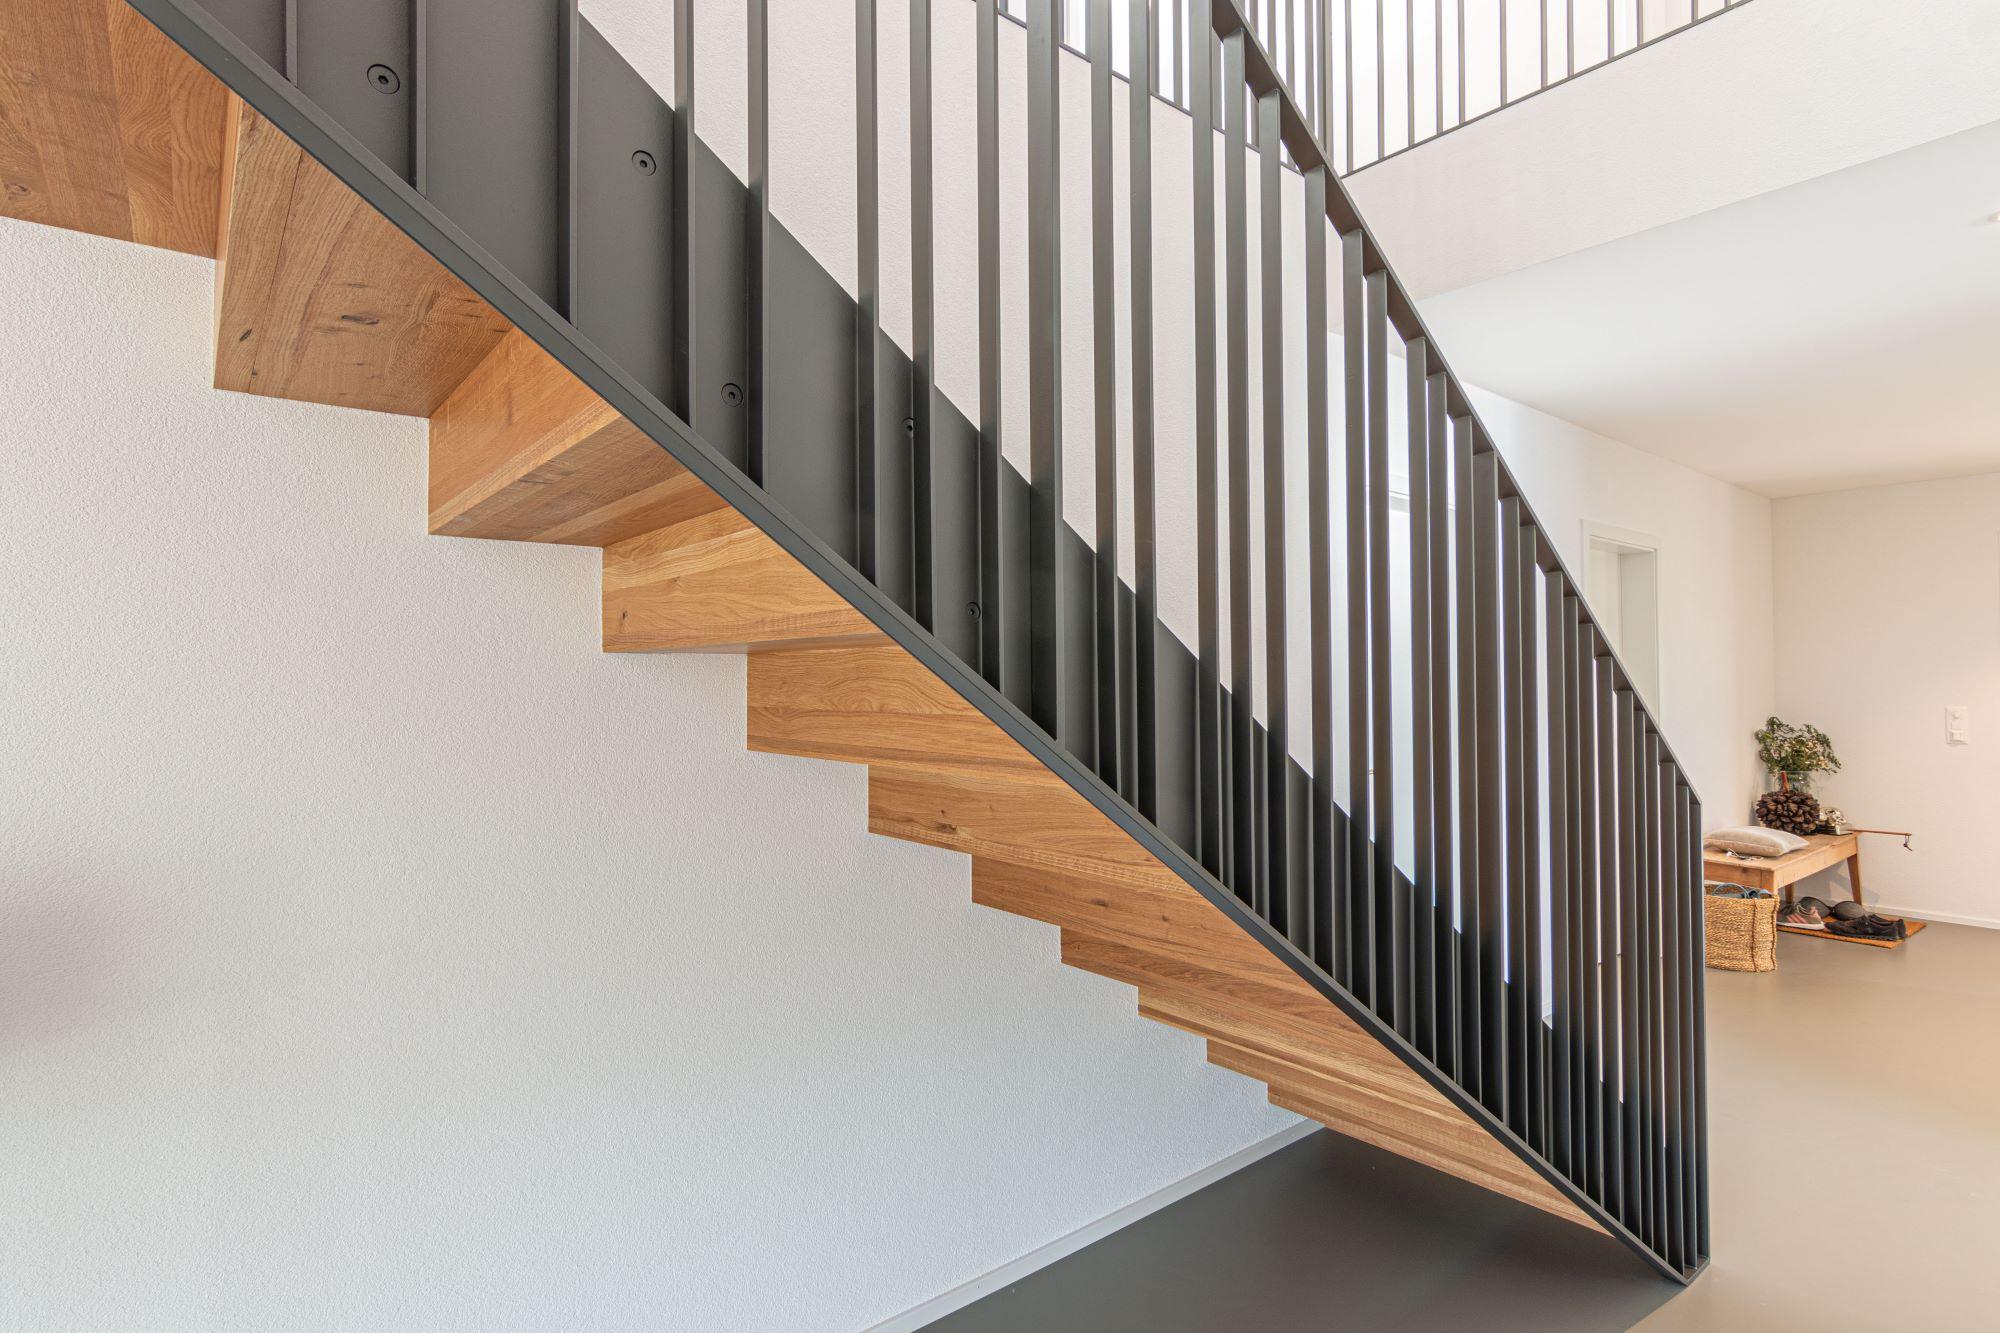 Stair Image 1293